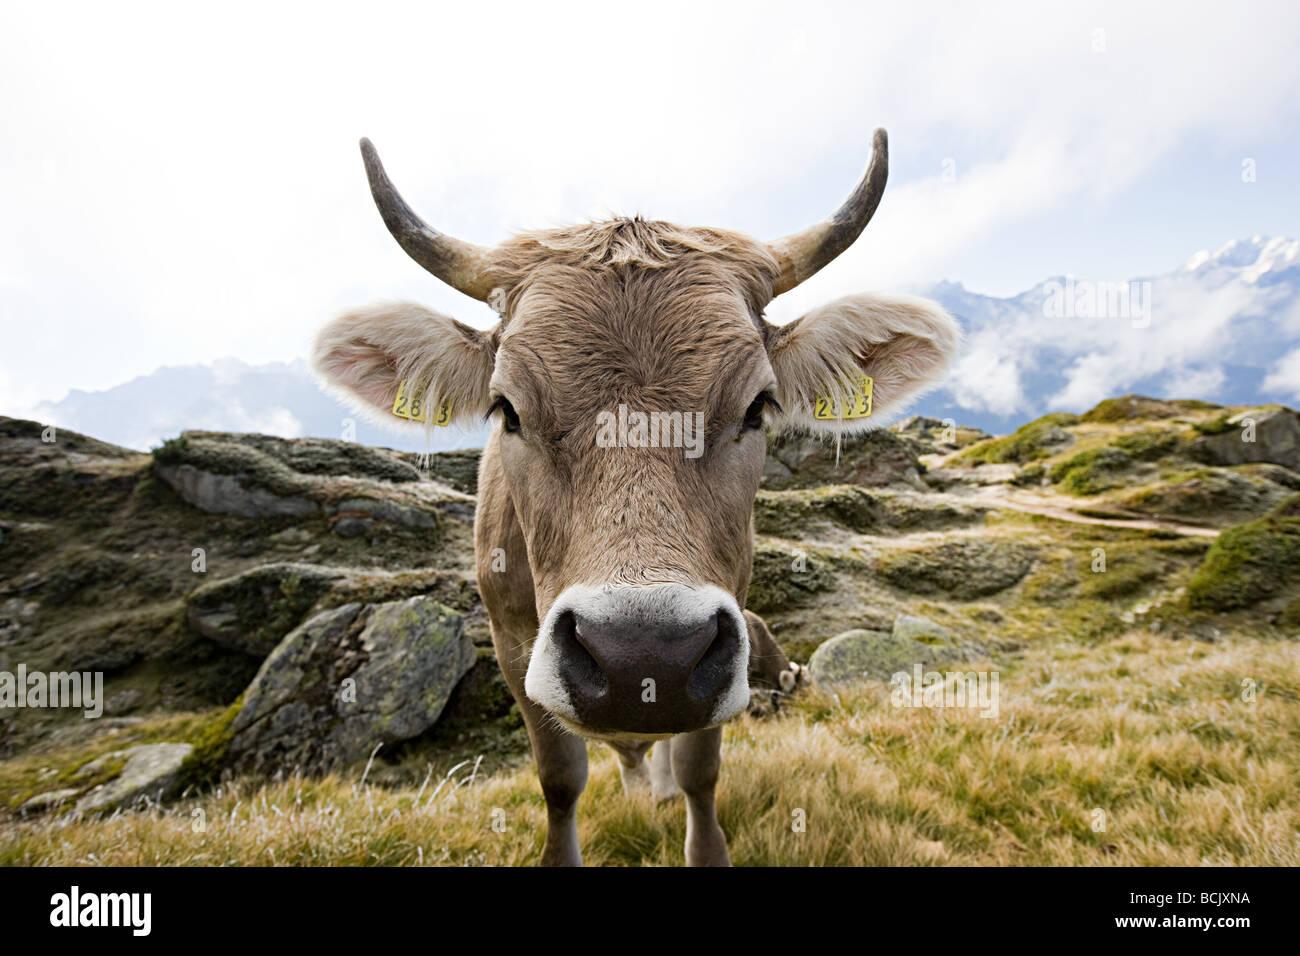 Cow in a swiss field - Stock Image